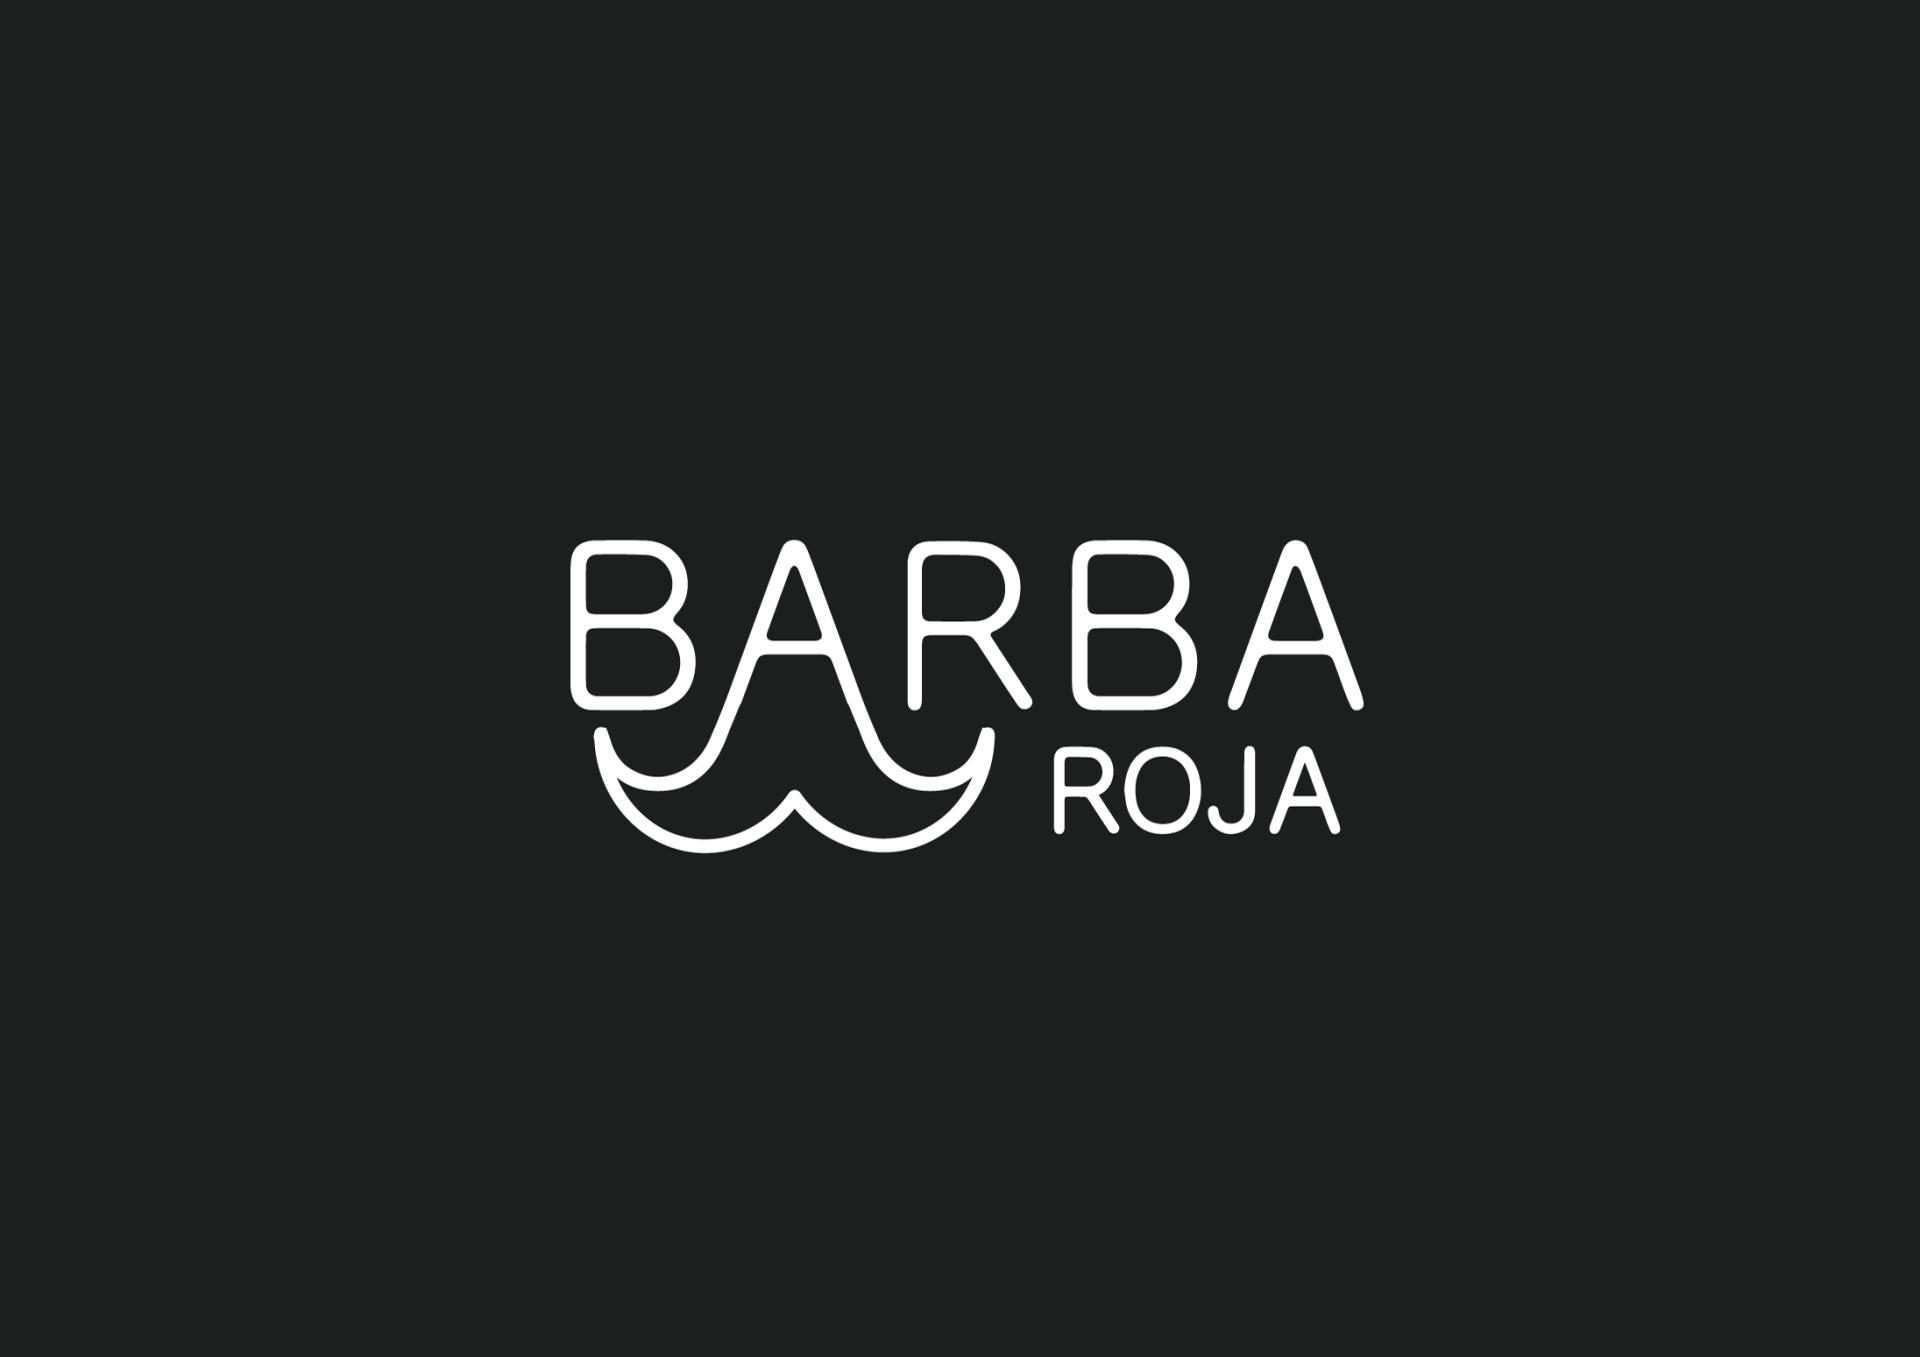 barbaroja3